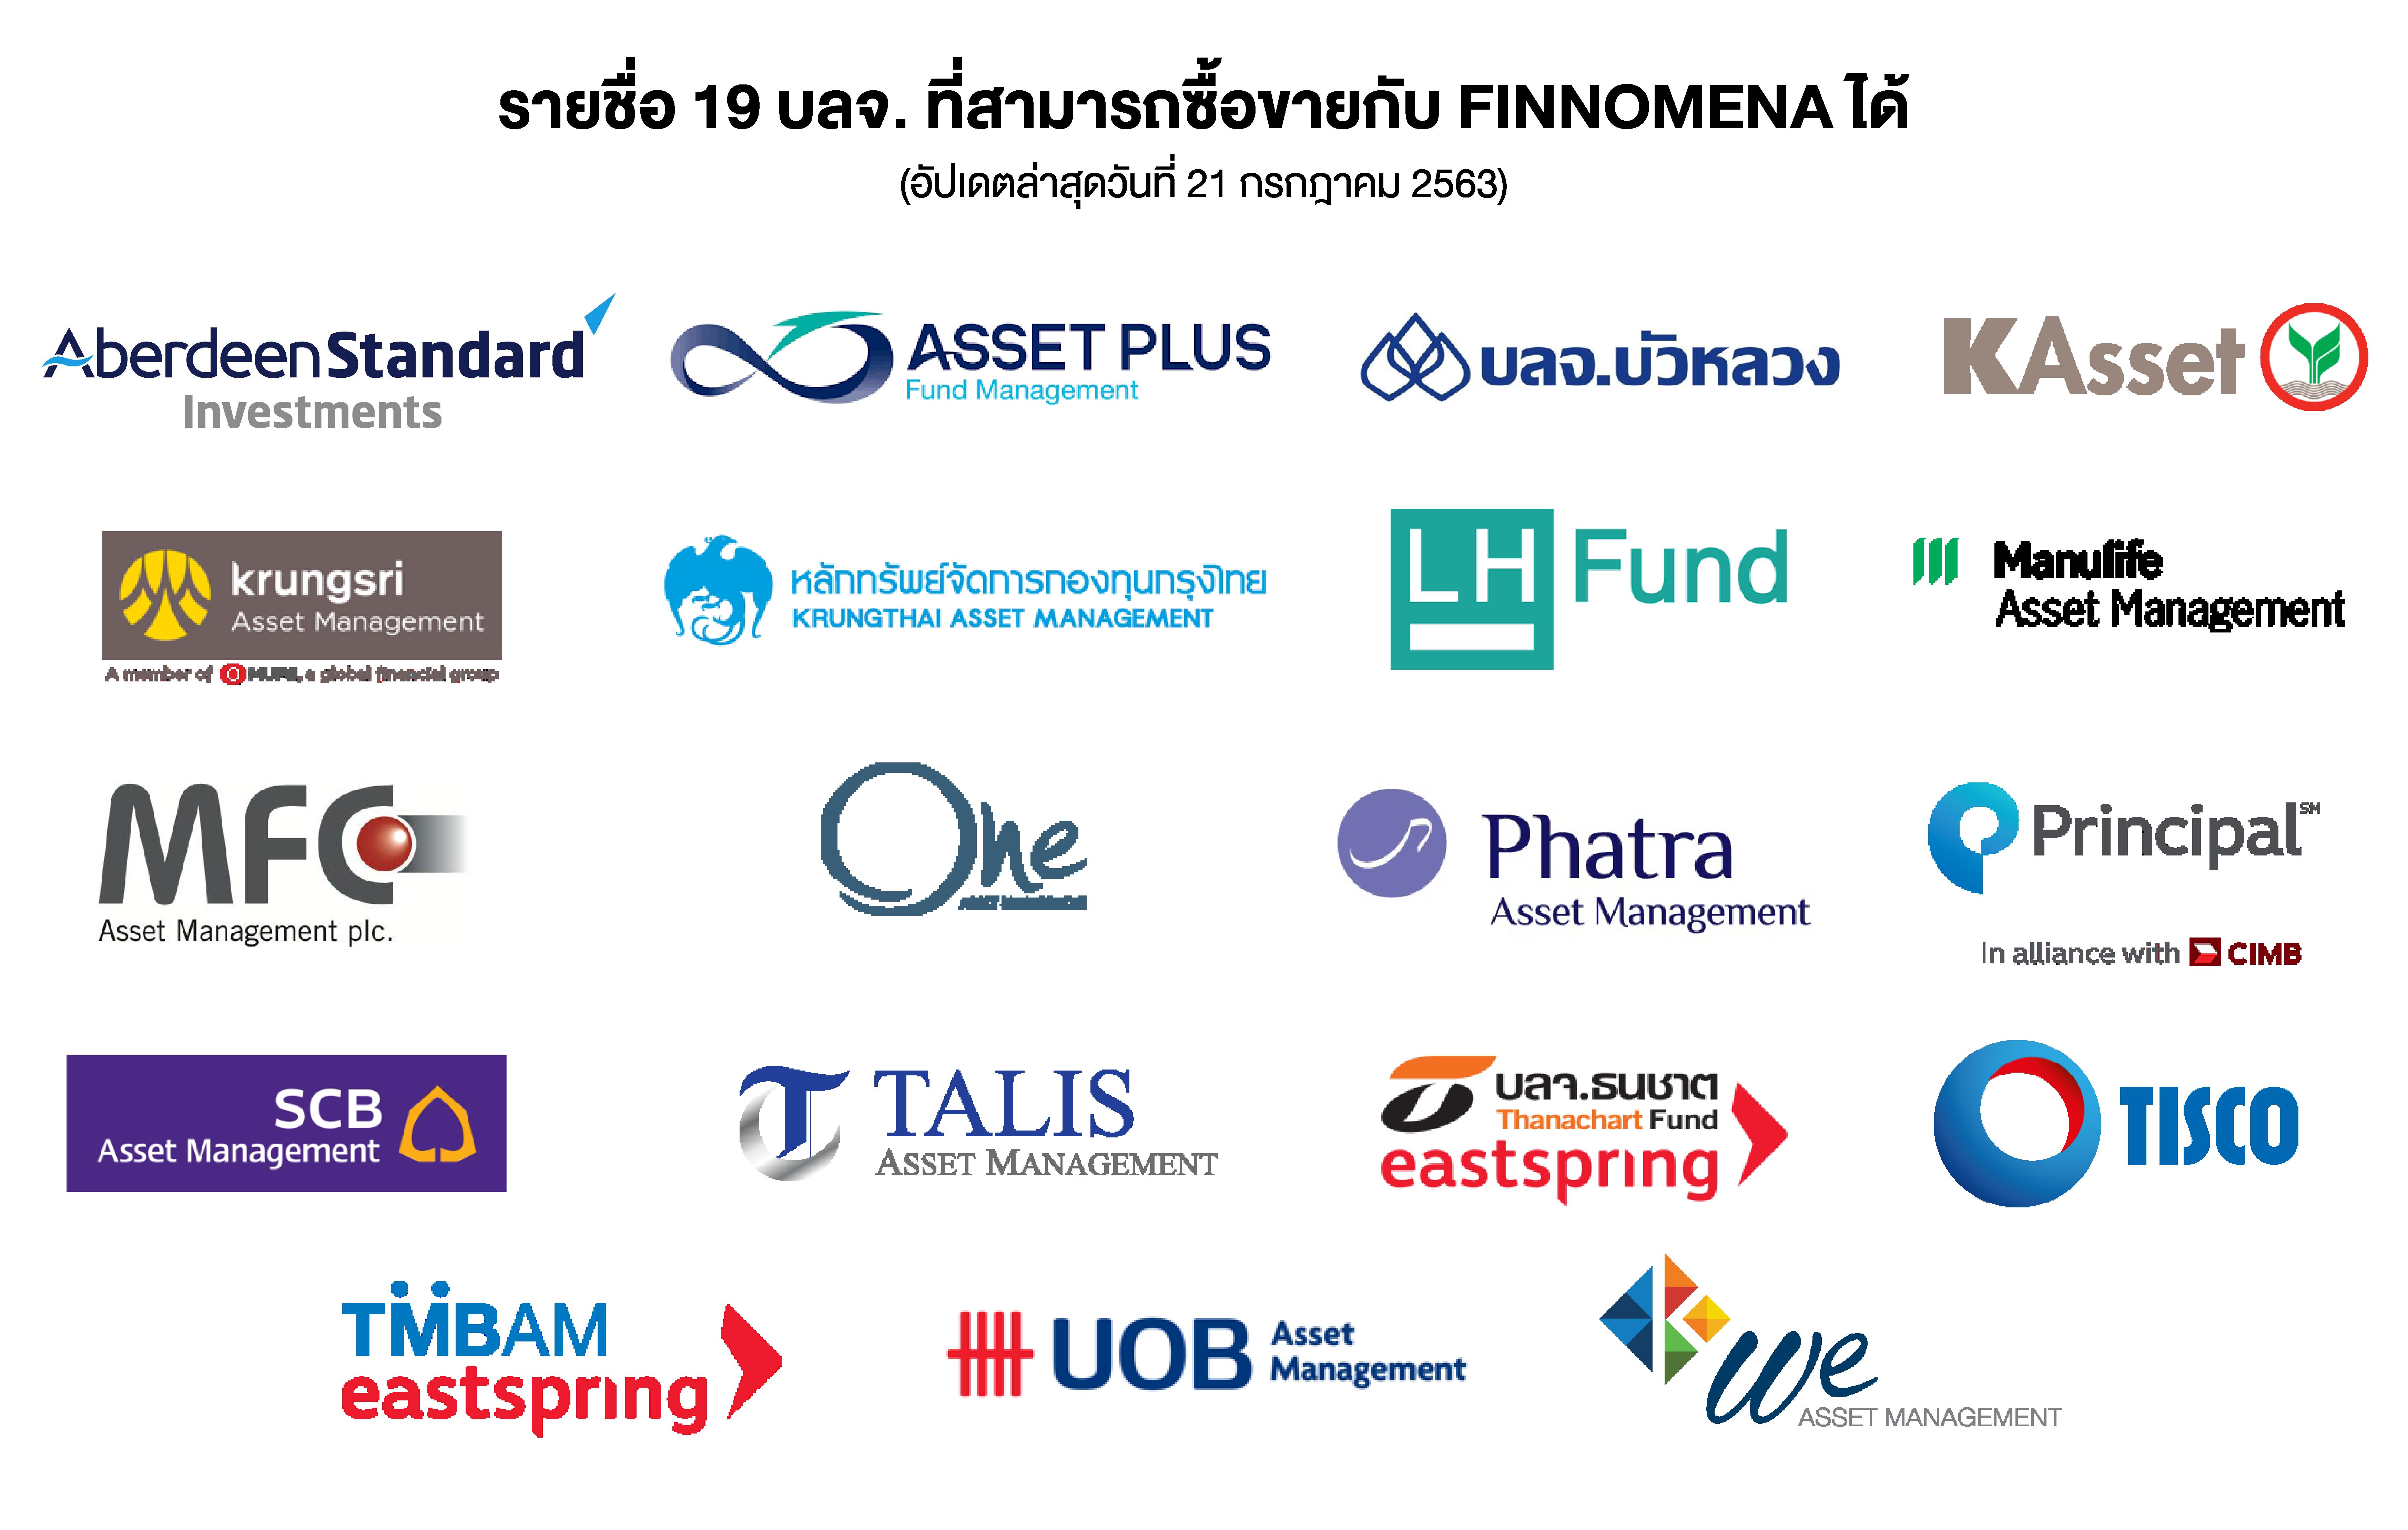 finnomena-asset-management